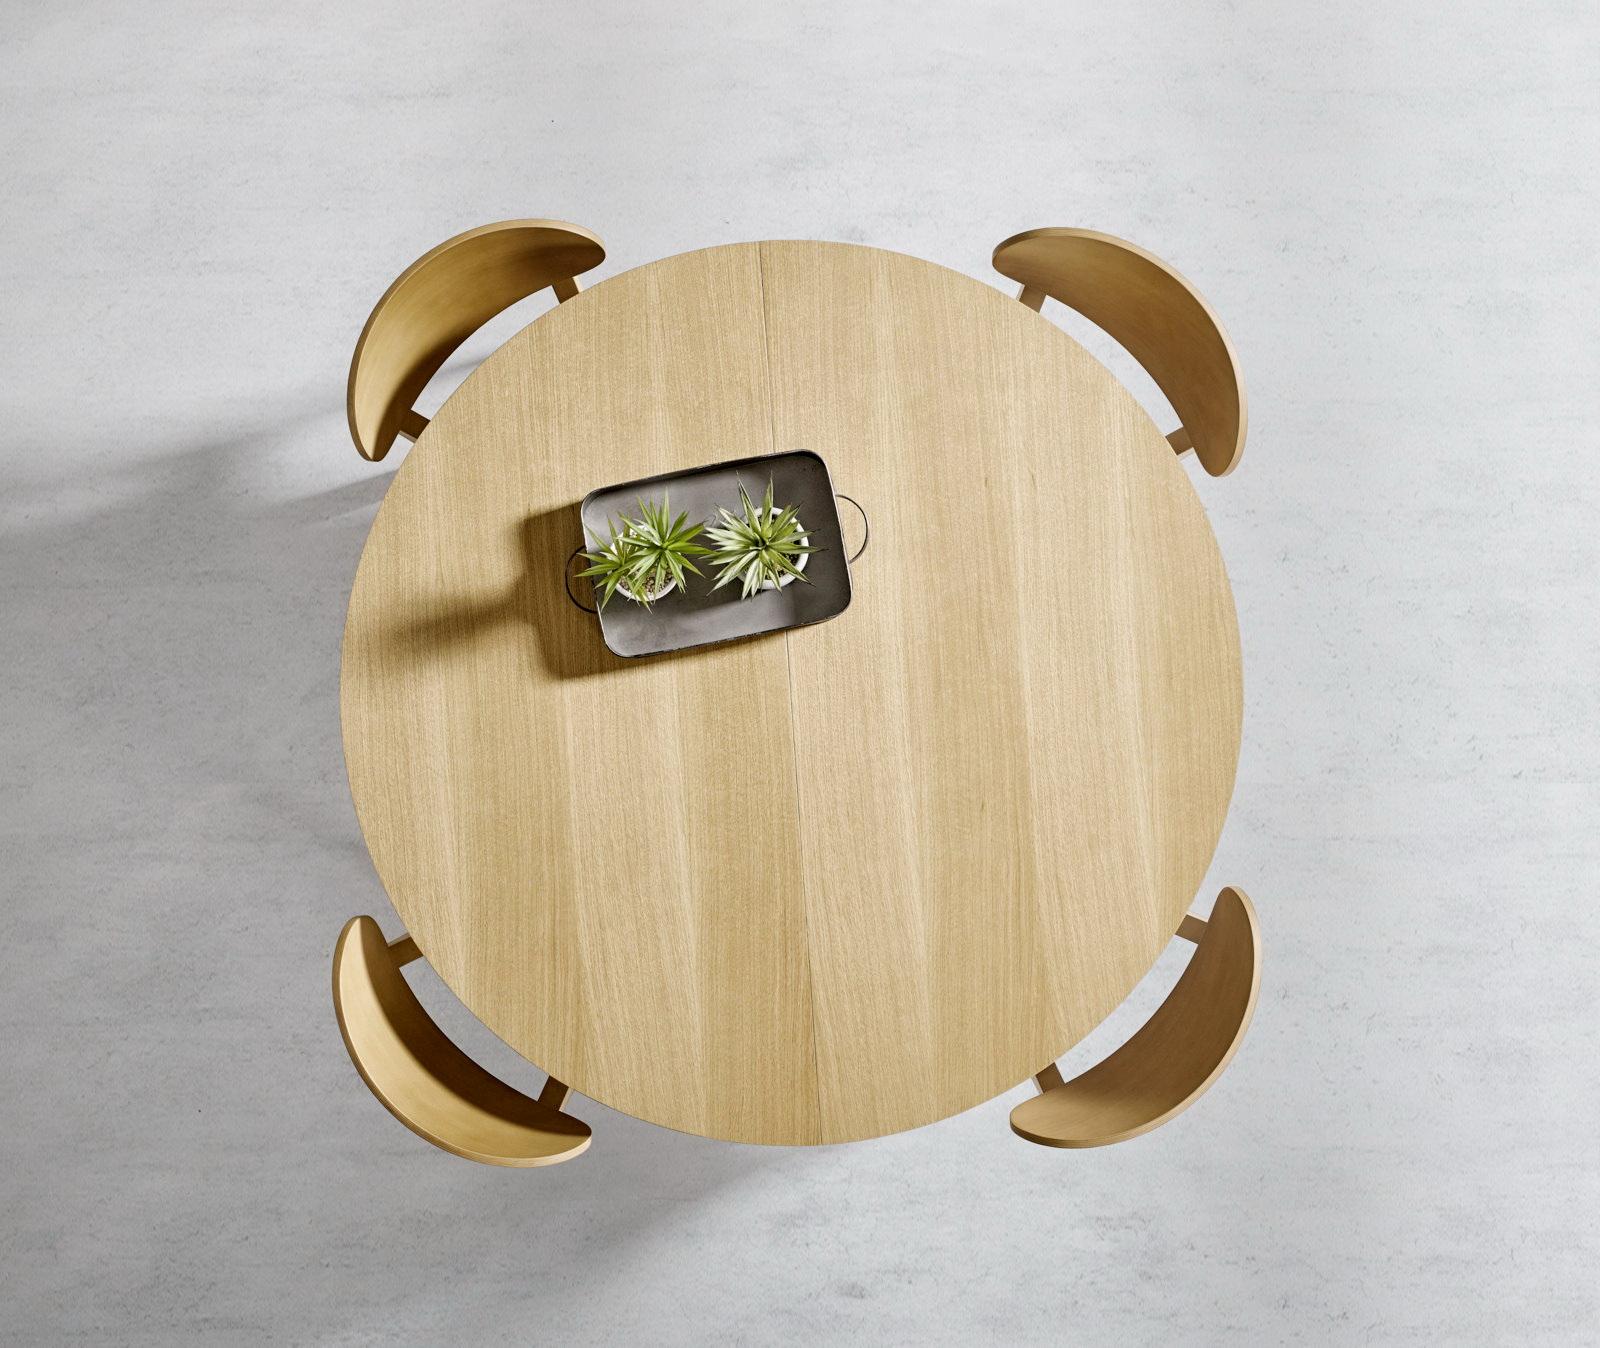 MESA COMEDOR Redonda Extensible Moderna Milo 1 by PEMI distribuida por muebles antoñán® León